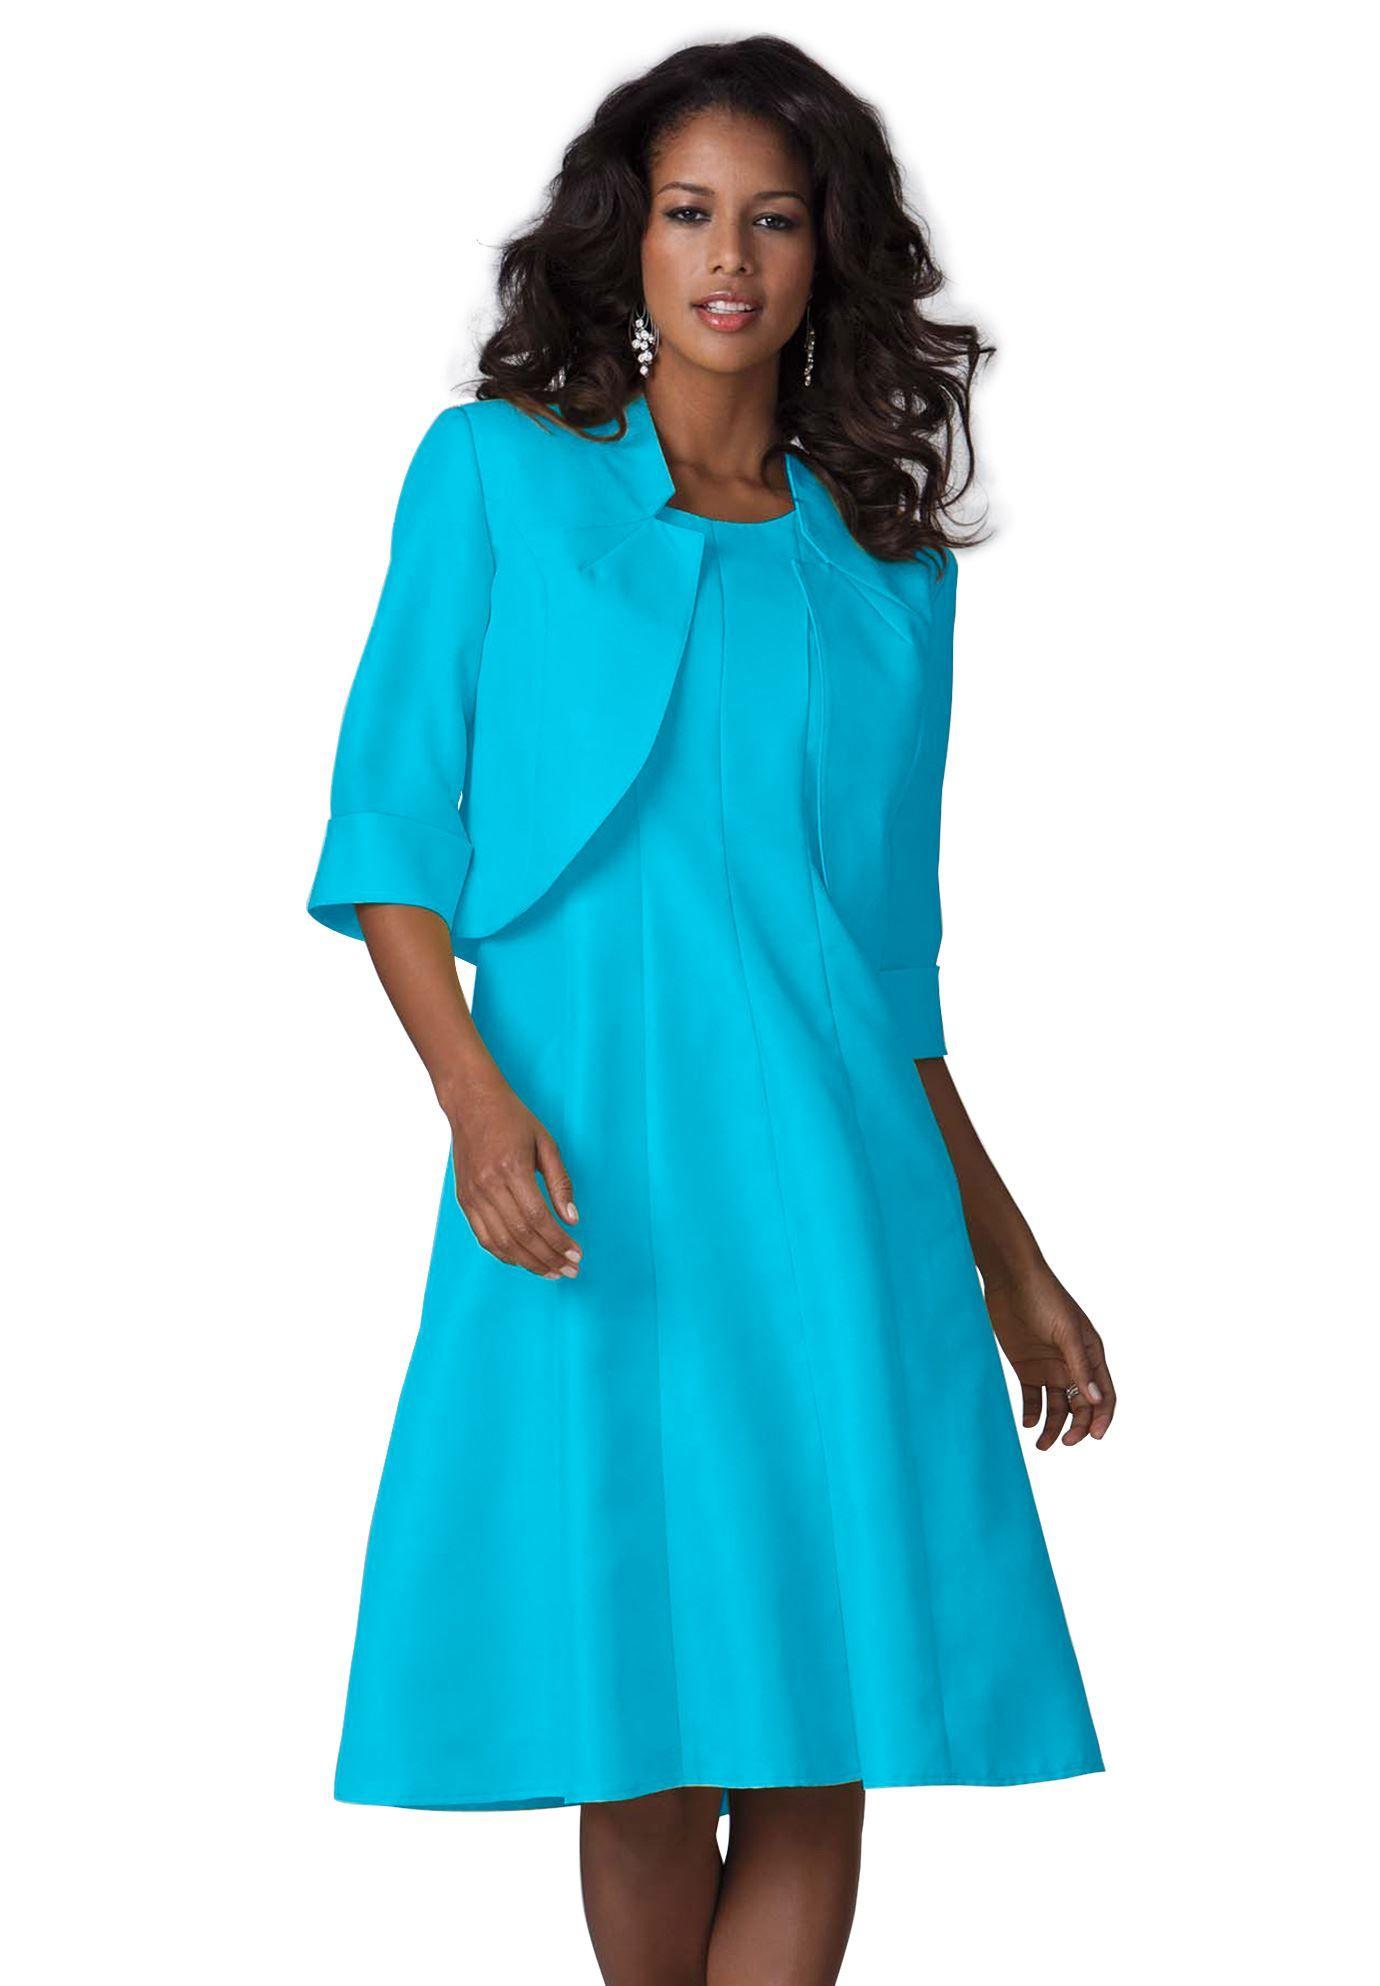 Plus size jacket dress for wedding  Full Bottom Fit and Flare Jacket Dress  Plus Size Special Occasions